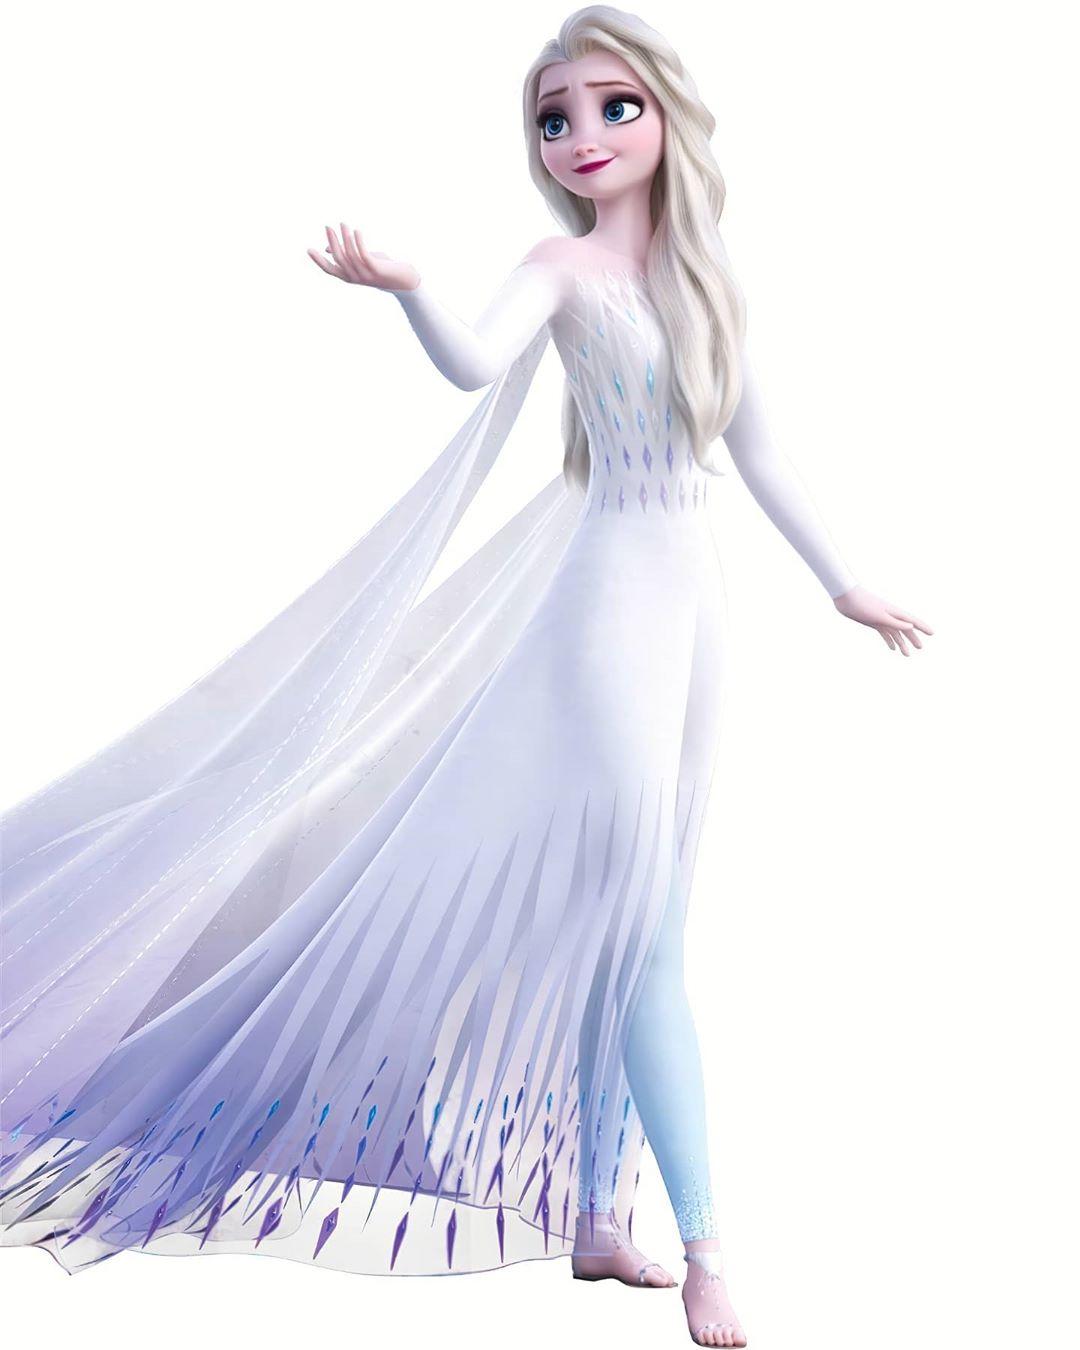 Emeraldblade95/Pure Good Proposal: Queen Elsa